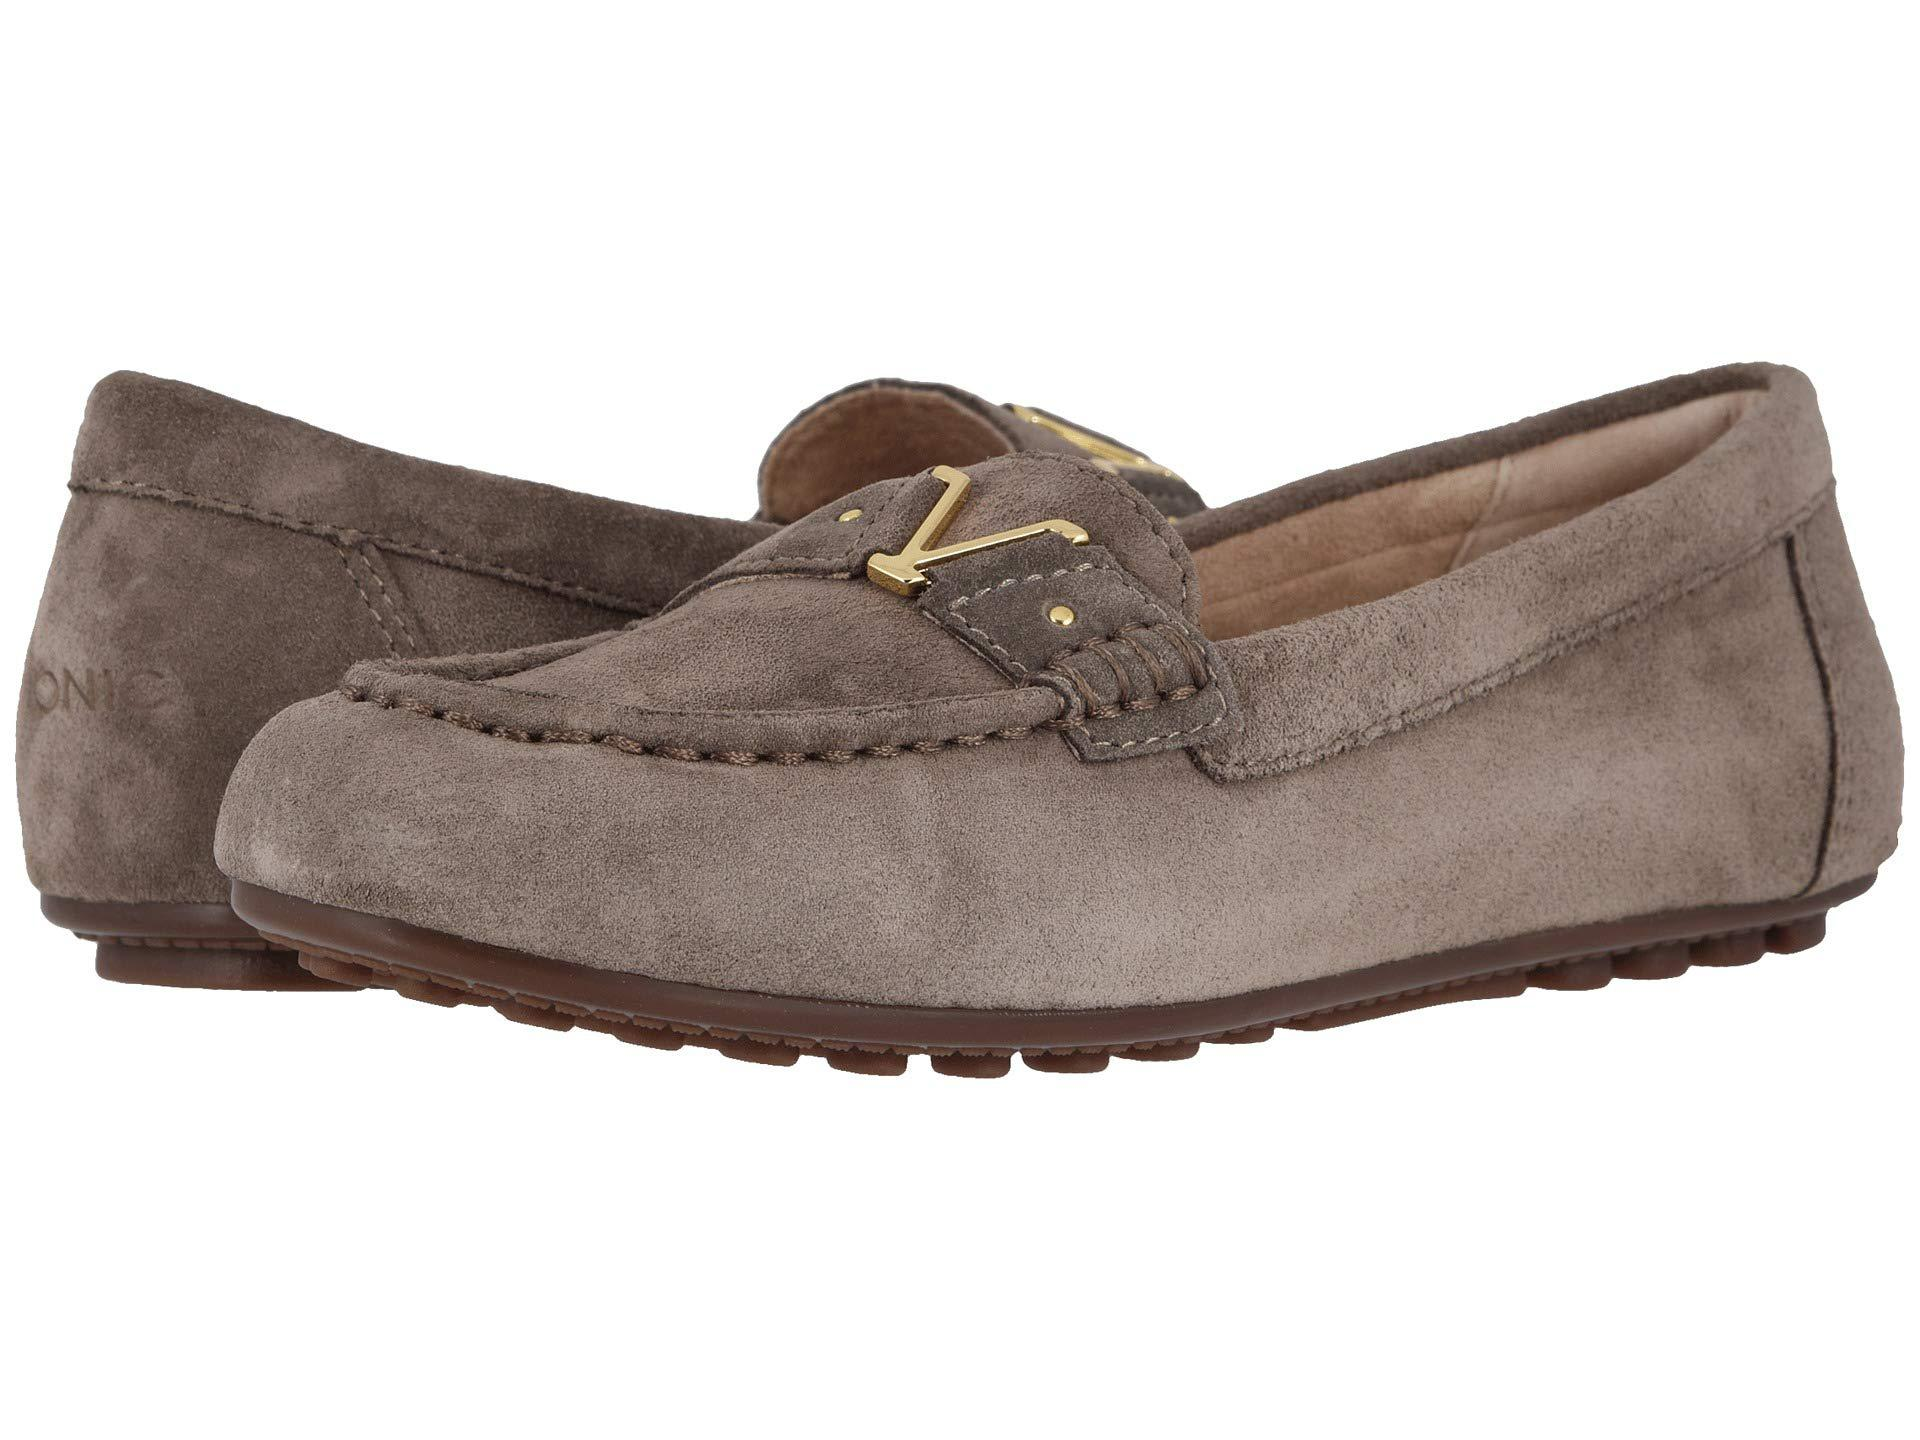 e8421cc2532 Lyst - Vionic Hilo (greige) Women s Shoes in Brown